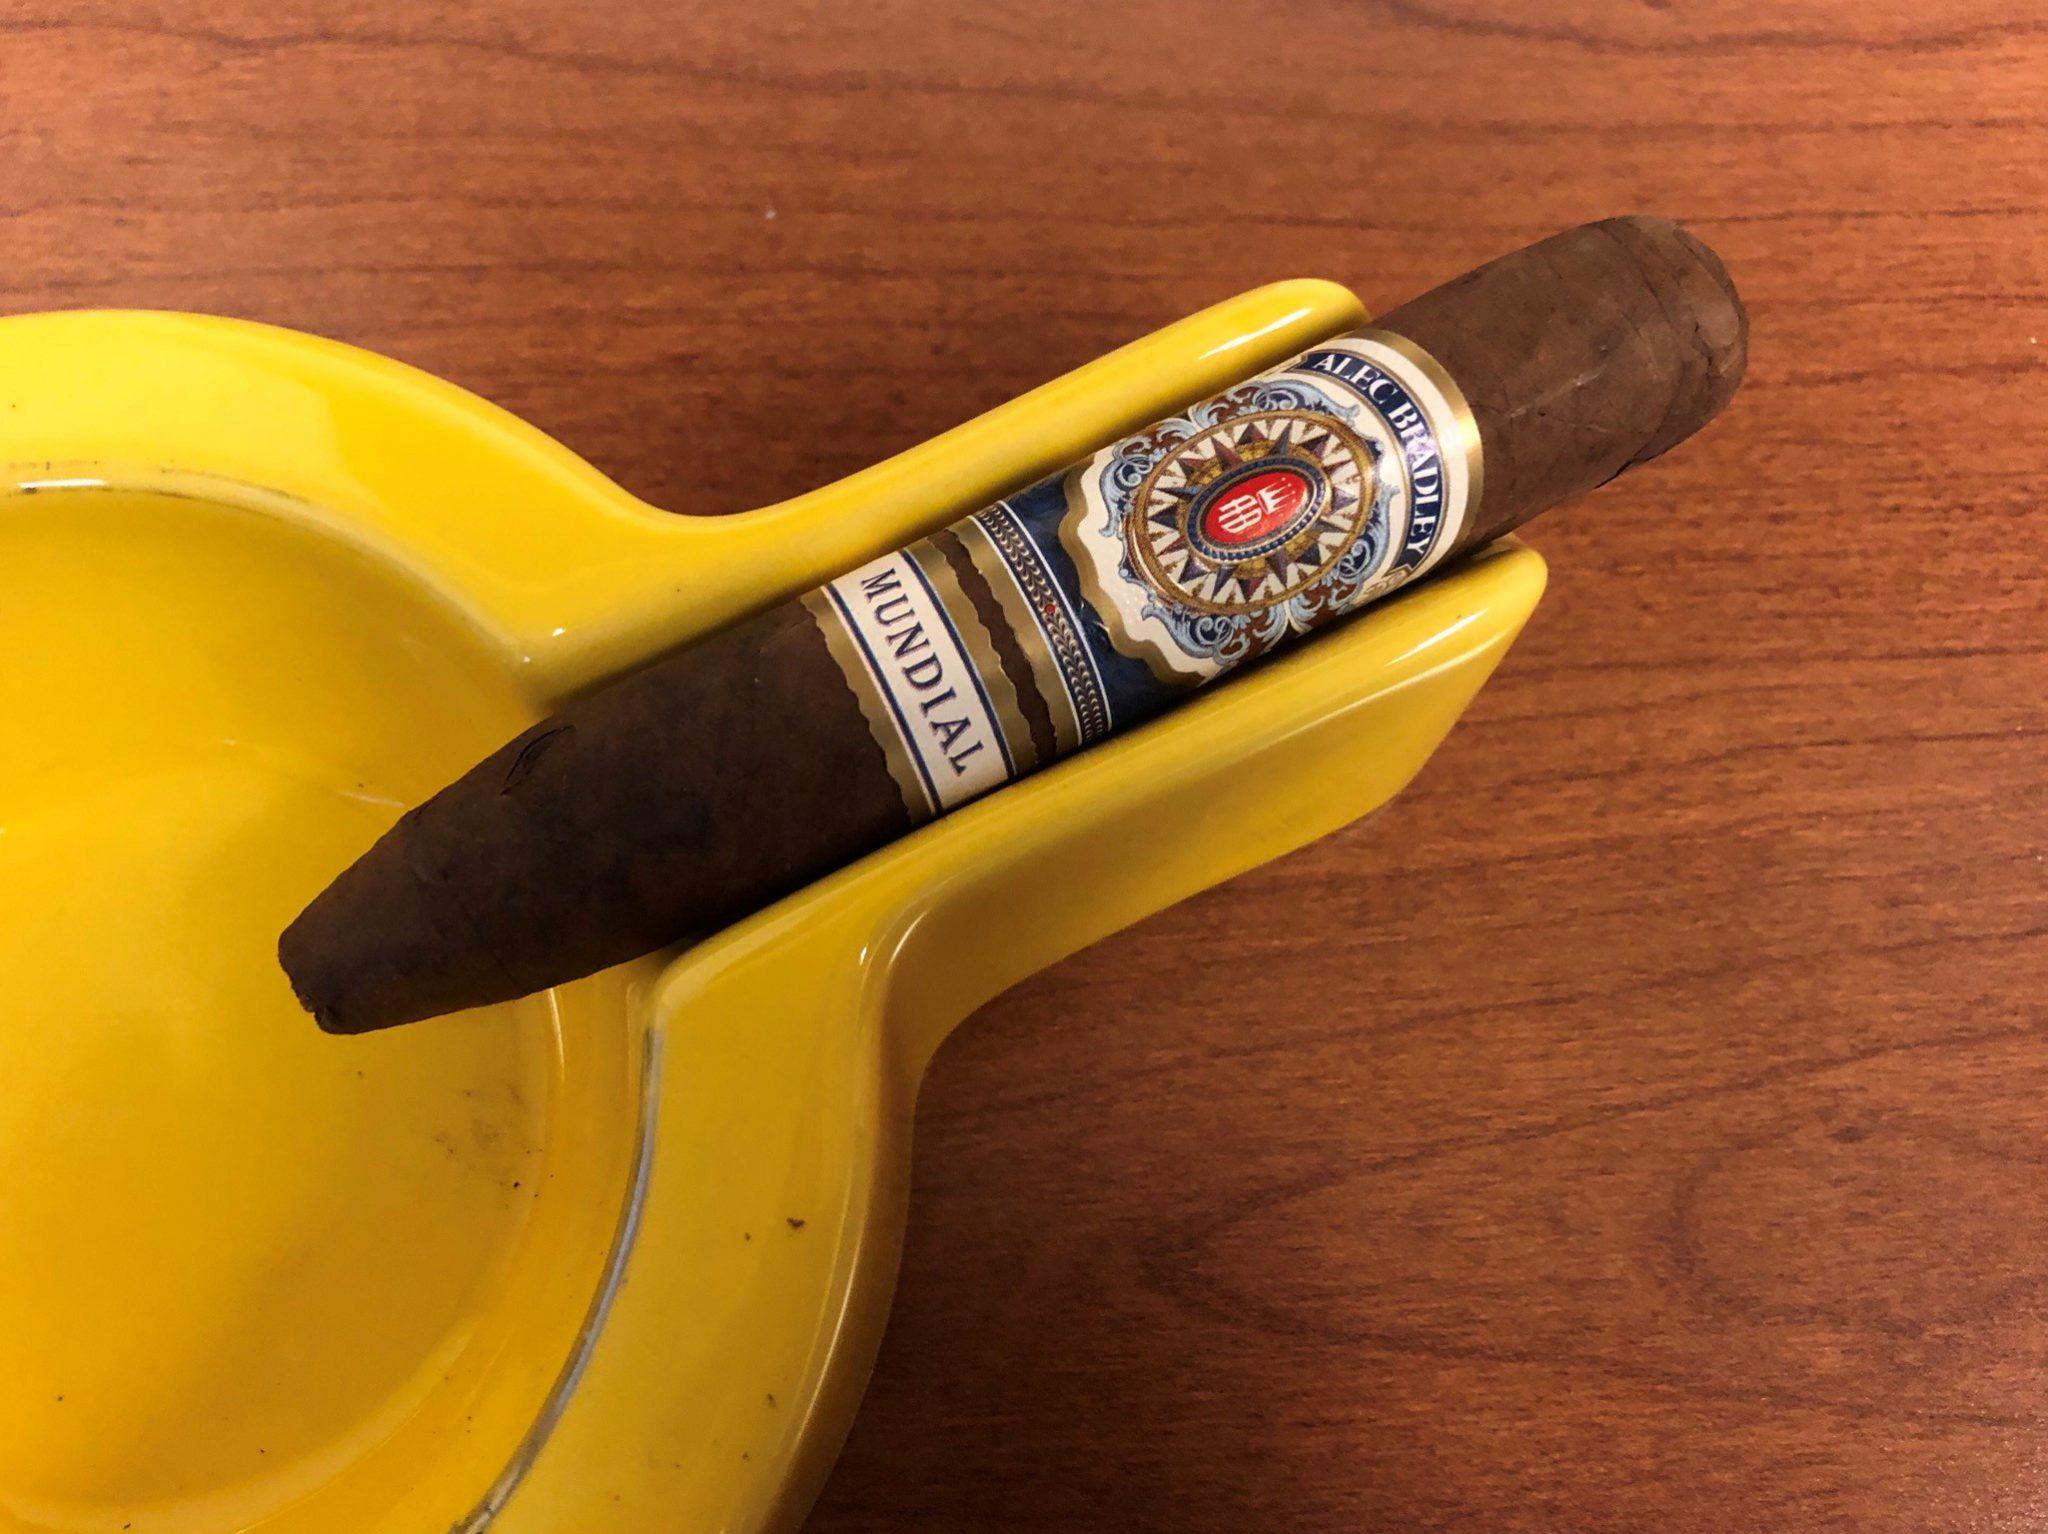 Alec Bradley cigars guide Alec Bradley Mundial Punta Lanza No. 5 cigar review by Jared Gulick